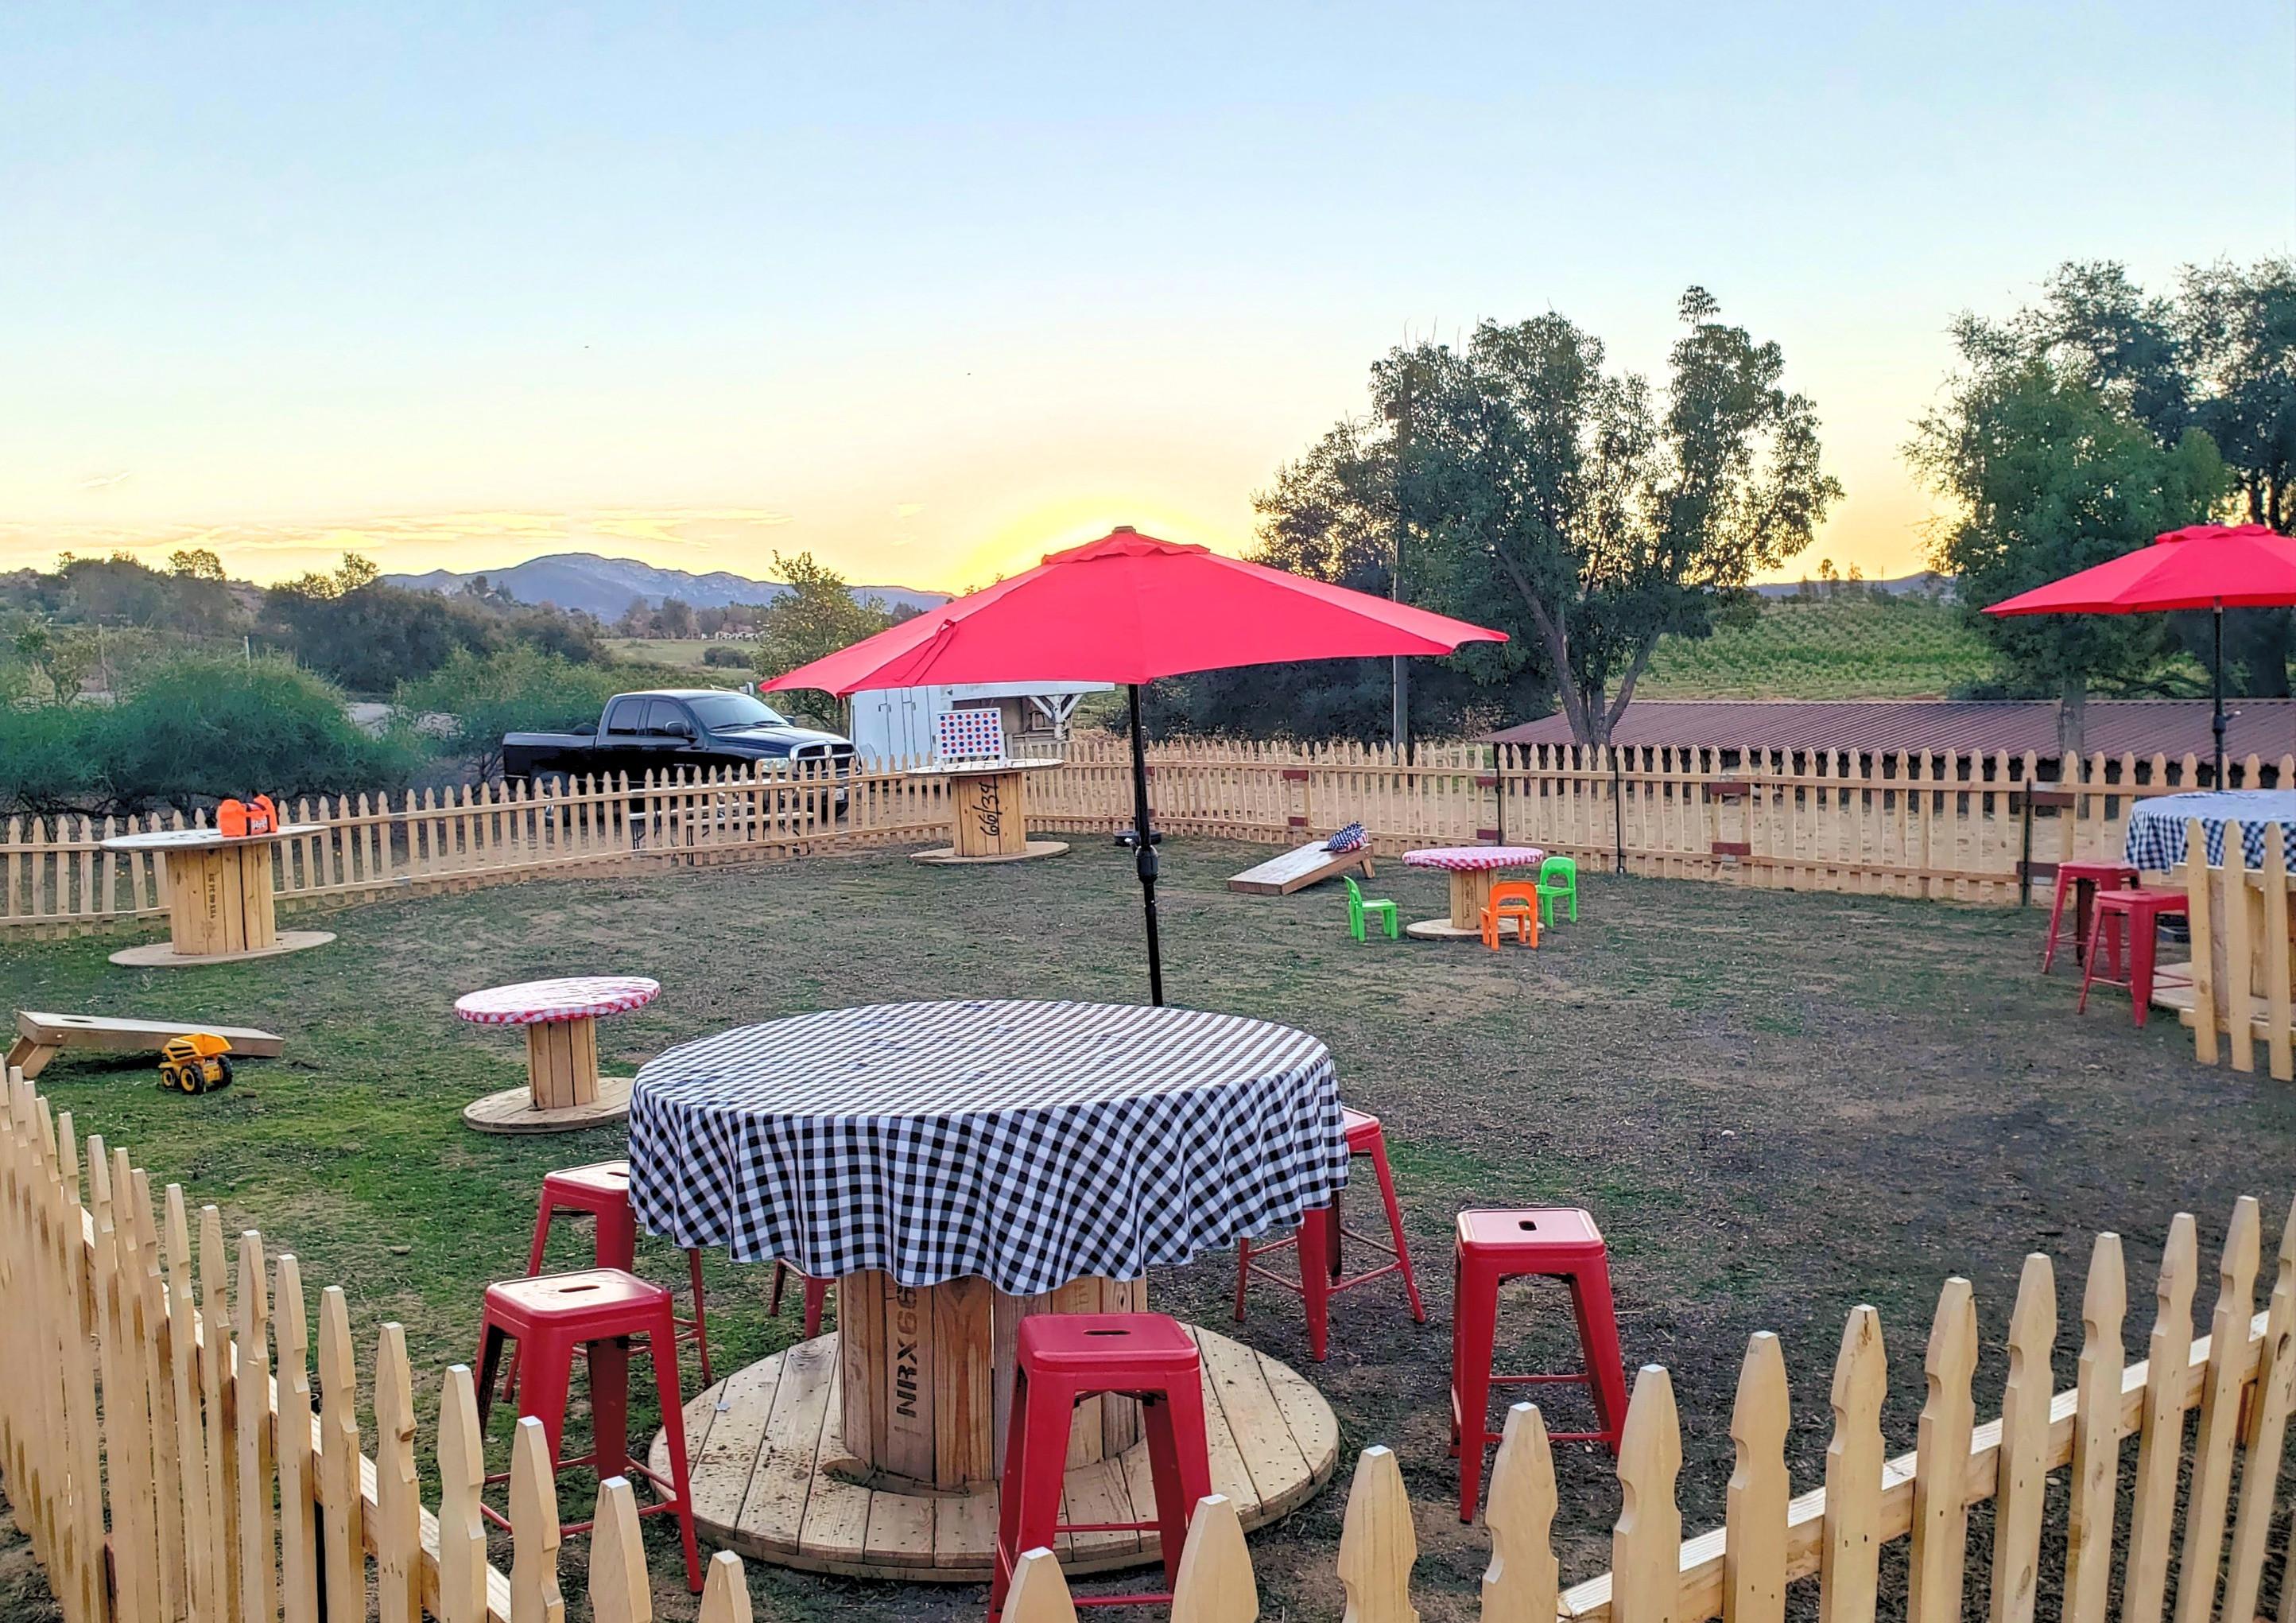 Birthdays at the Ranch